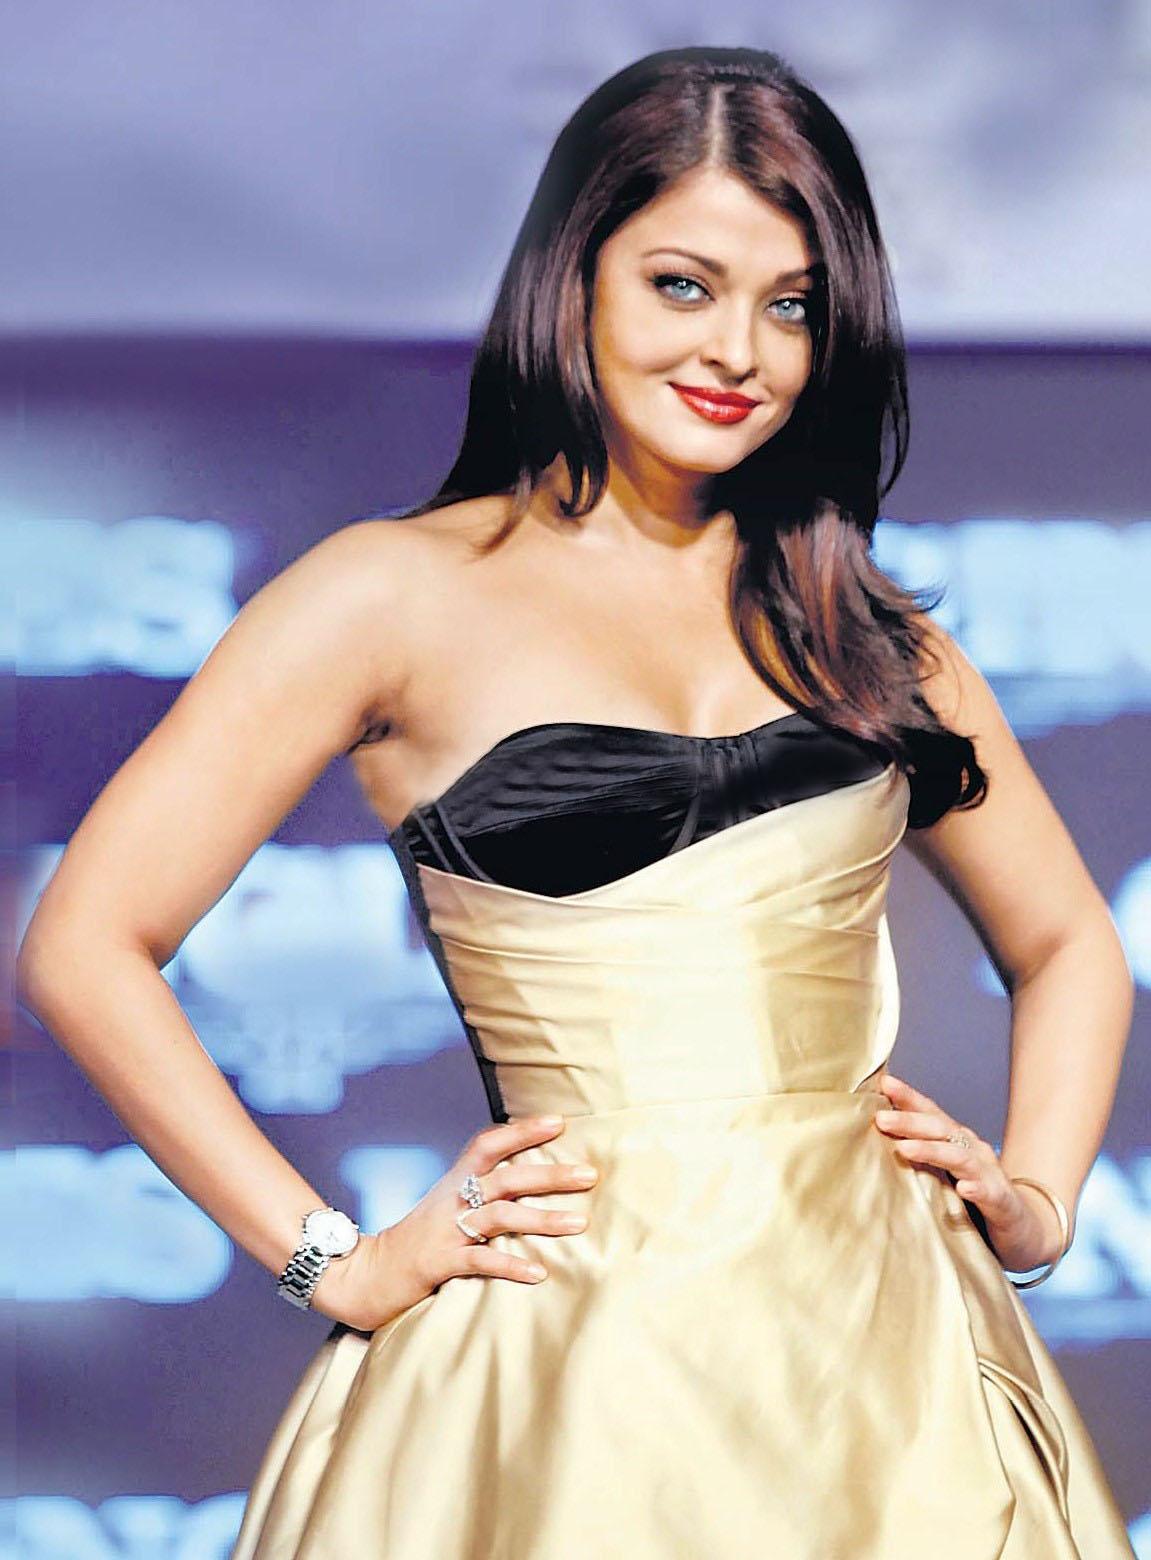 http://1.bp.blogspot.com/-DmdOIVjAKJ4/ThlVNEjnvlI/AAAAAAAAKvs/WADTDvkQf60/s1600/Aishwarya+Rai+Bachan+looking+gorgeous+hot+sexy+magaznie+scan.jpg